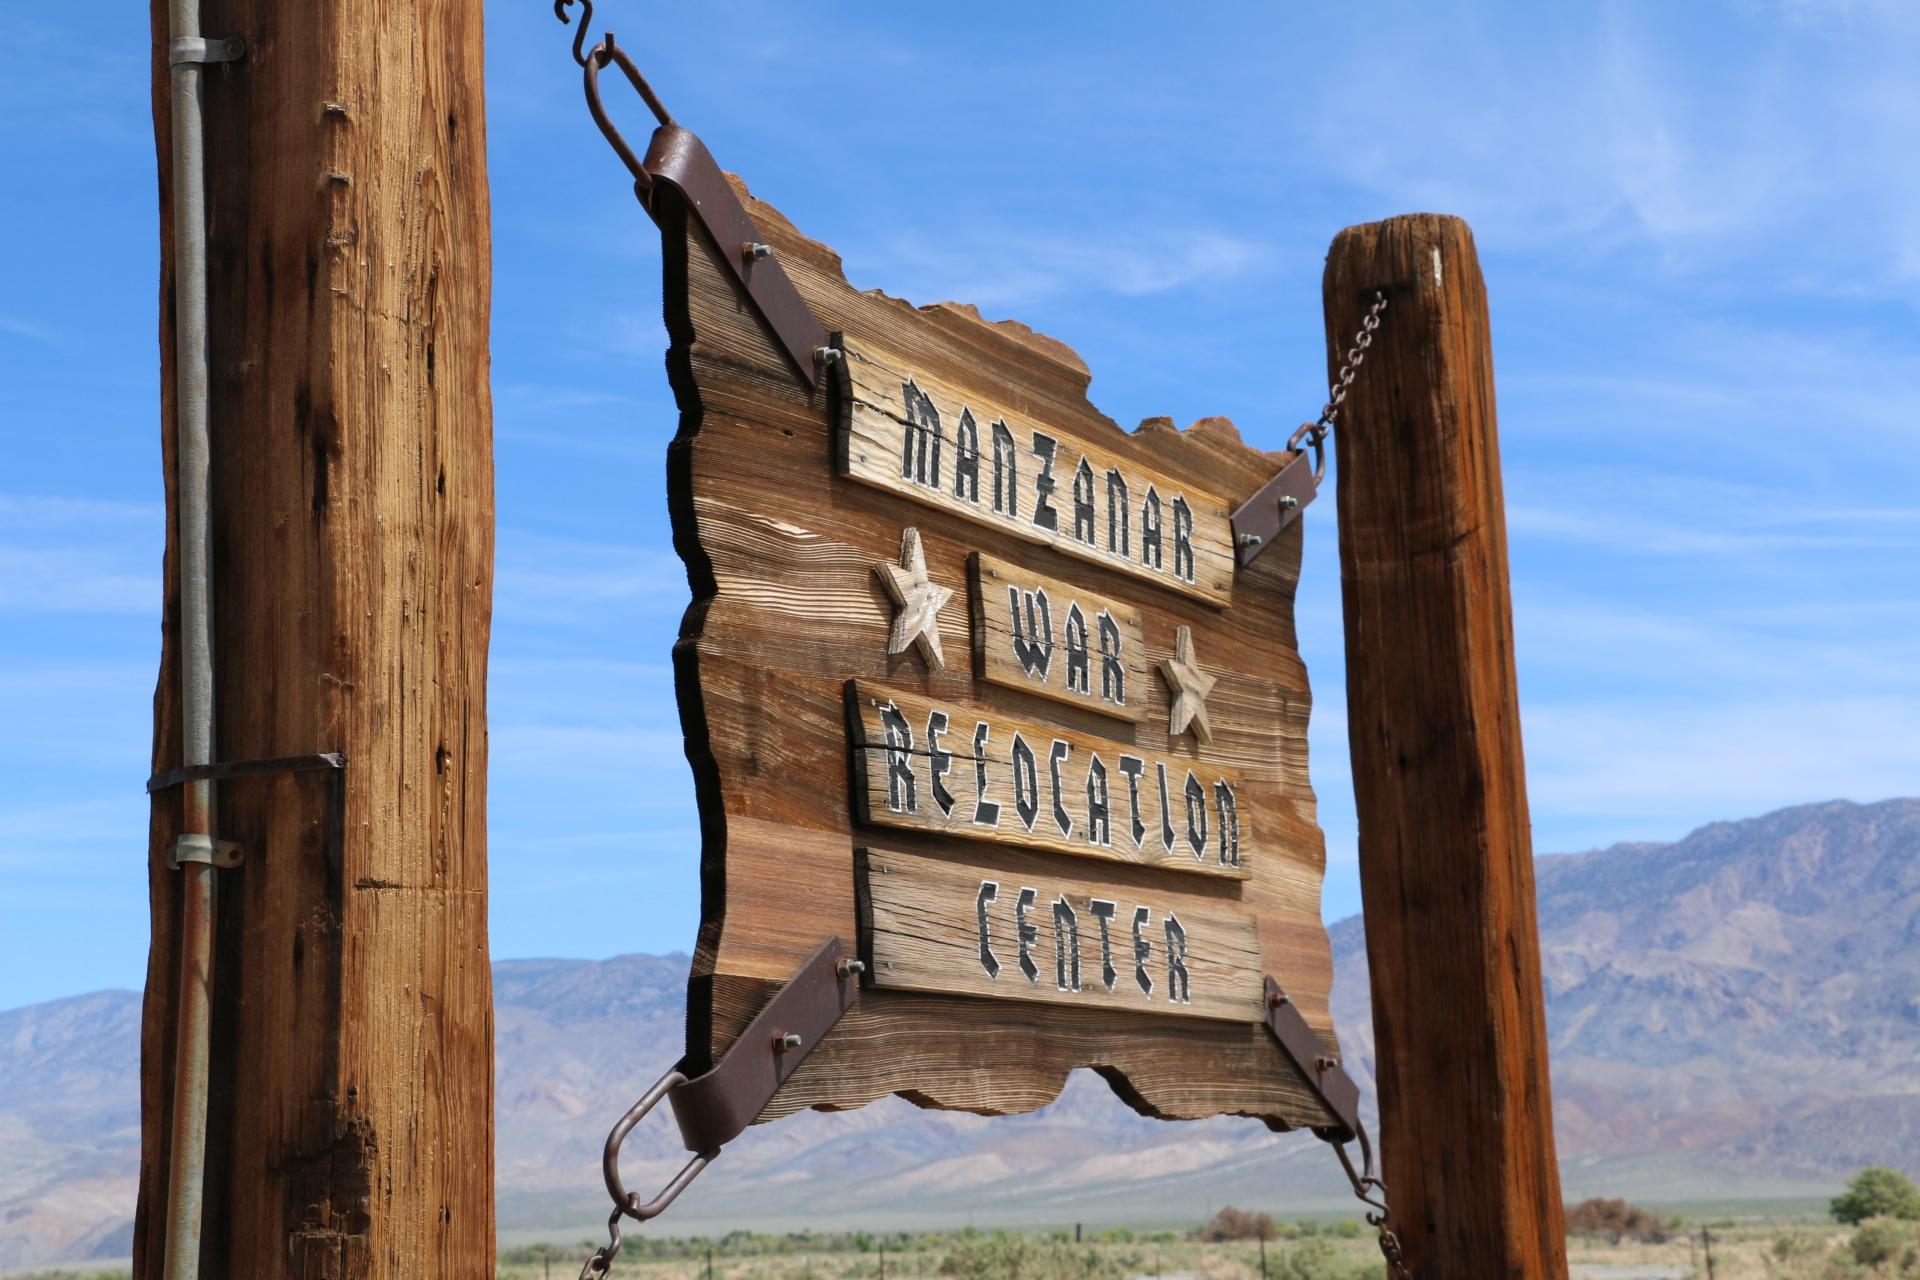 (Manzanar entrance sign. Photo Credit: Athena Mari Asklipiadis)